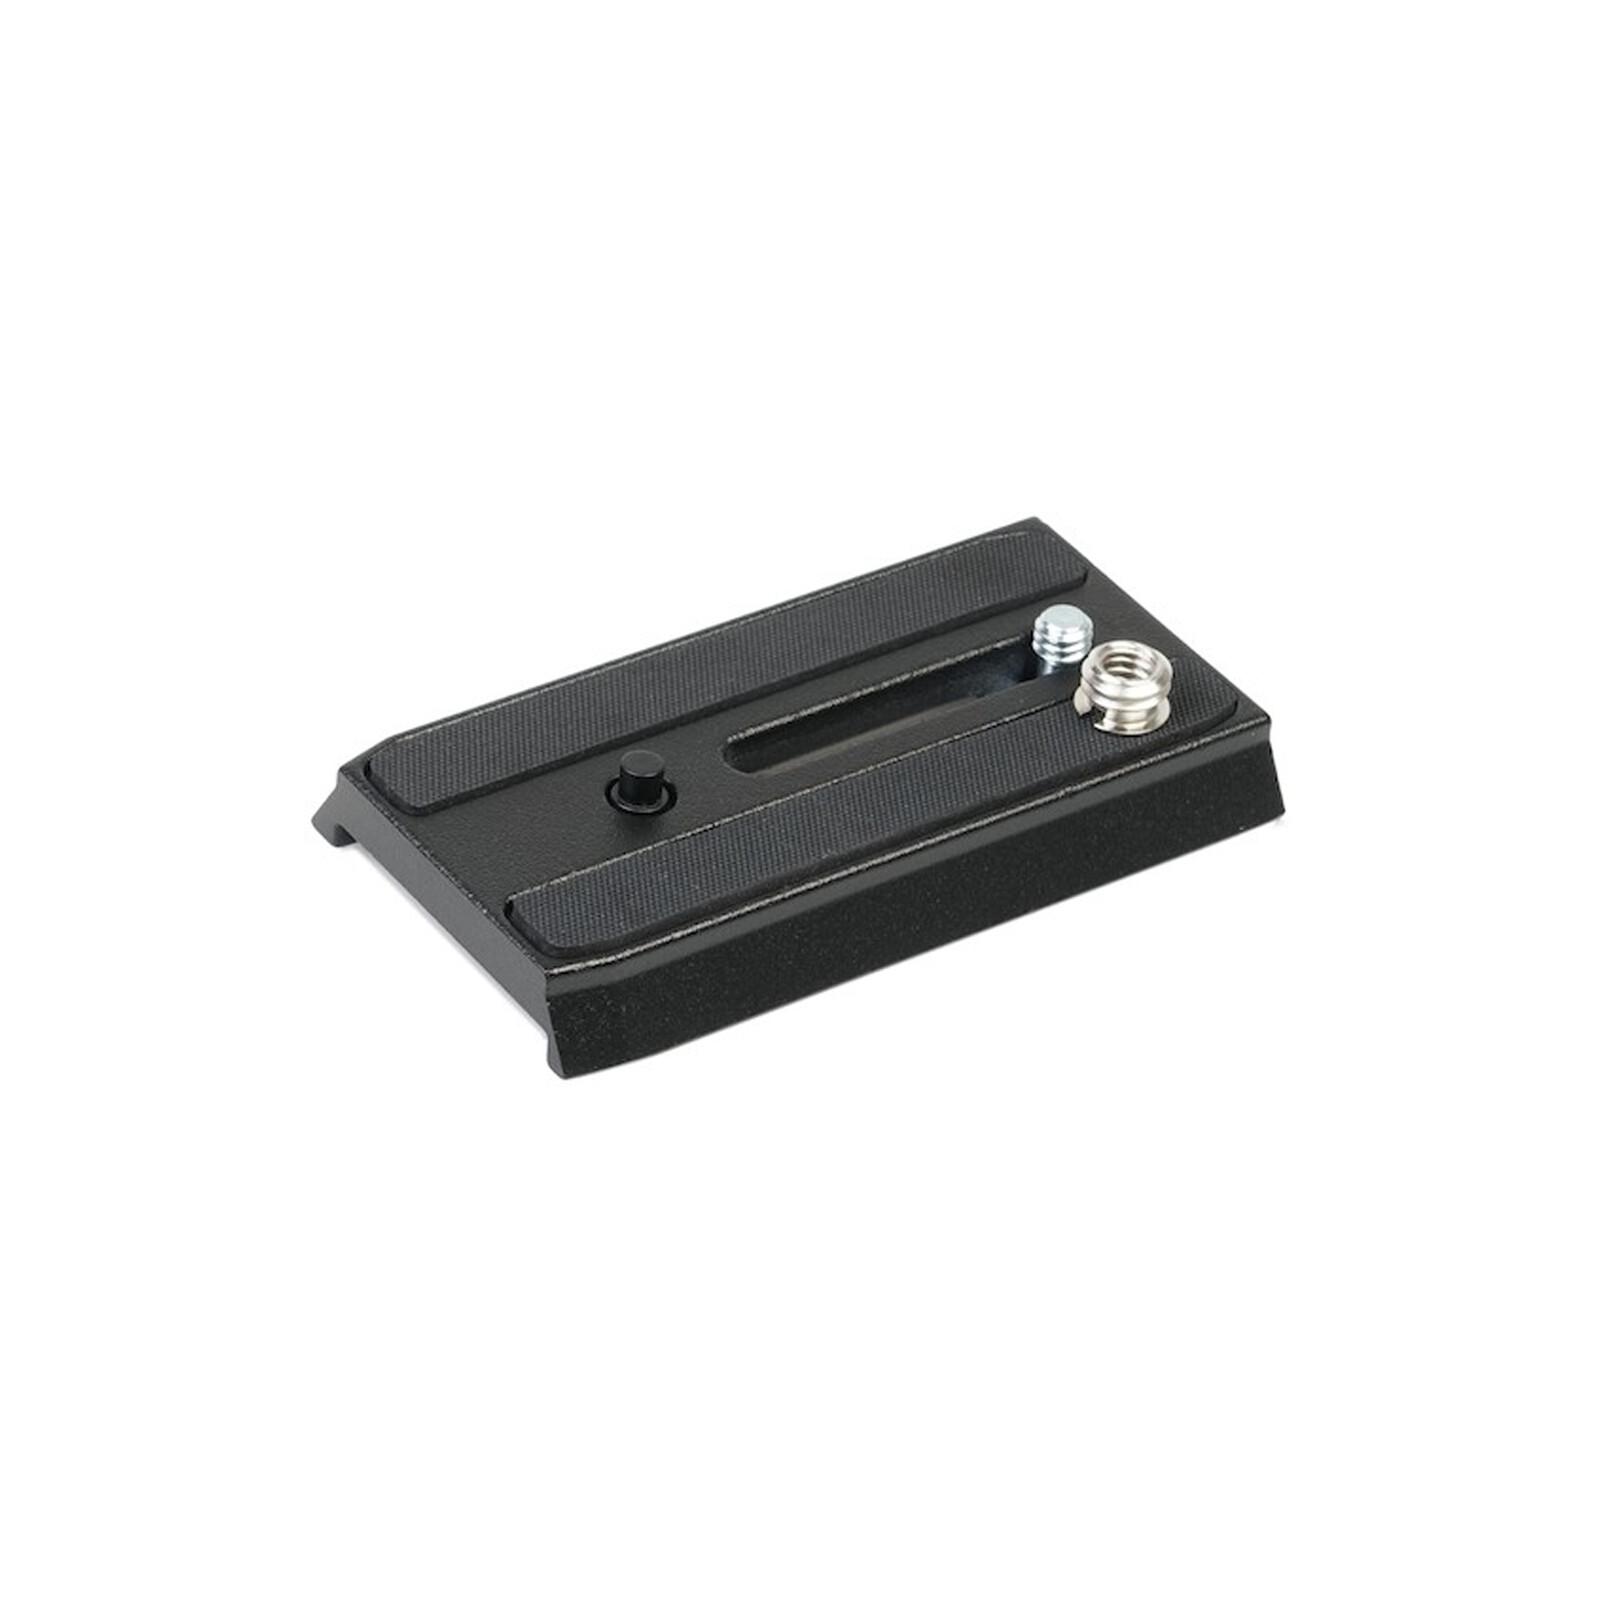 Manfrotto 501PL Videokamera-Platte